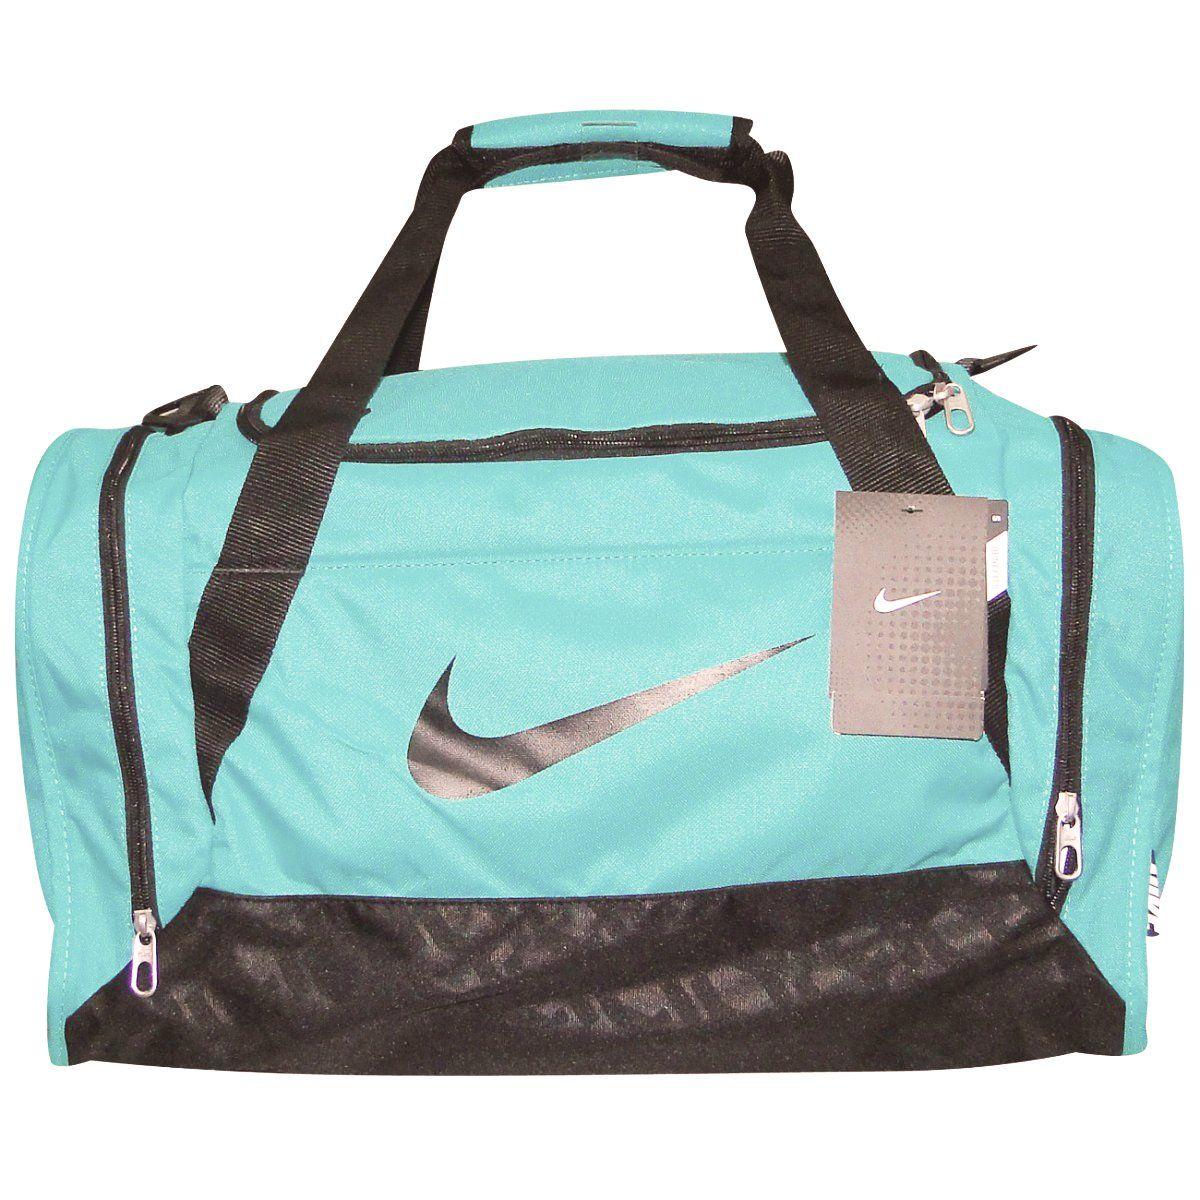 c9a332b59d24 Nike Brasilia 6 (Small) Duffel Bag